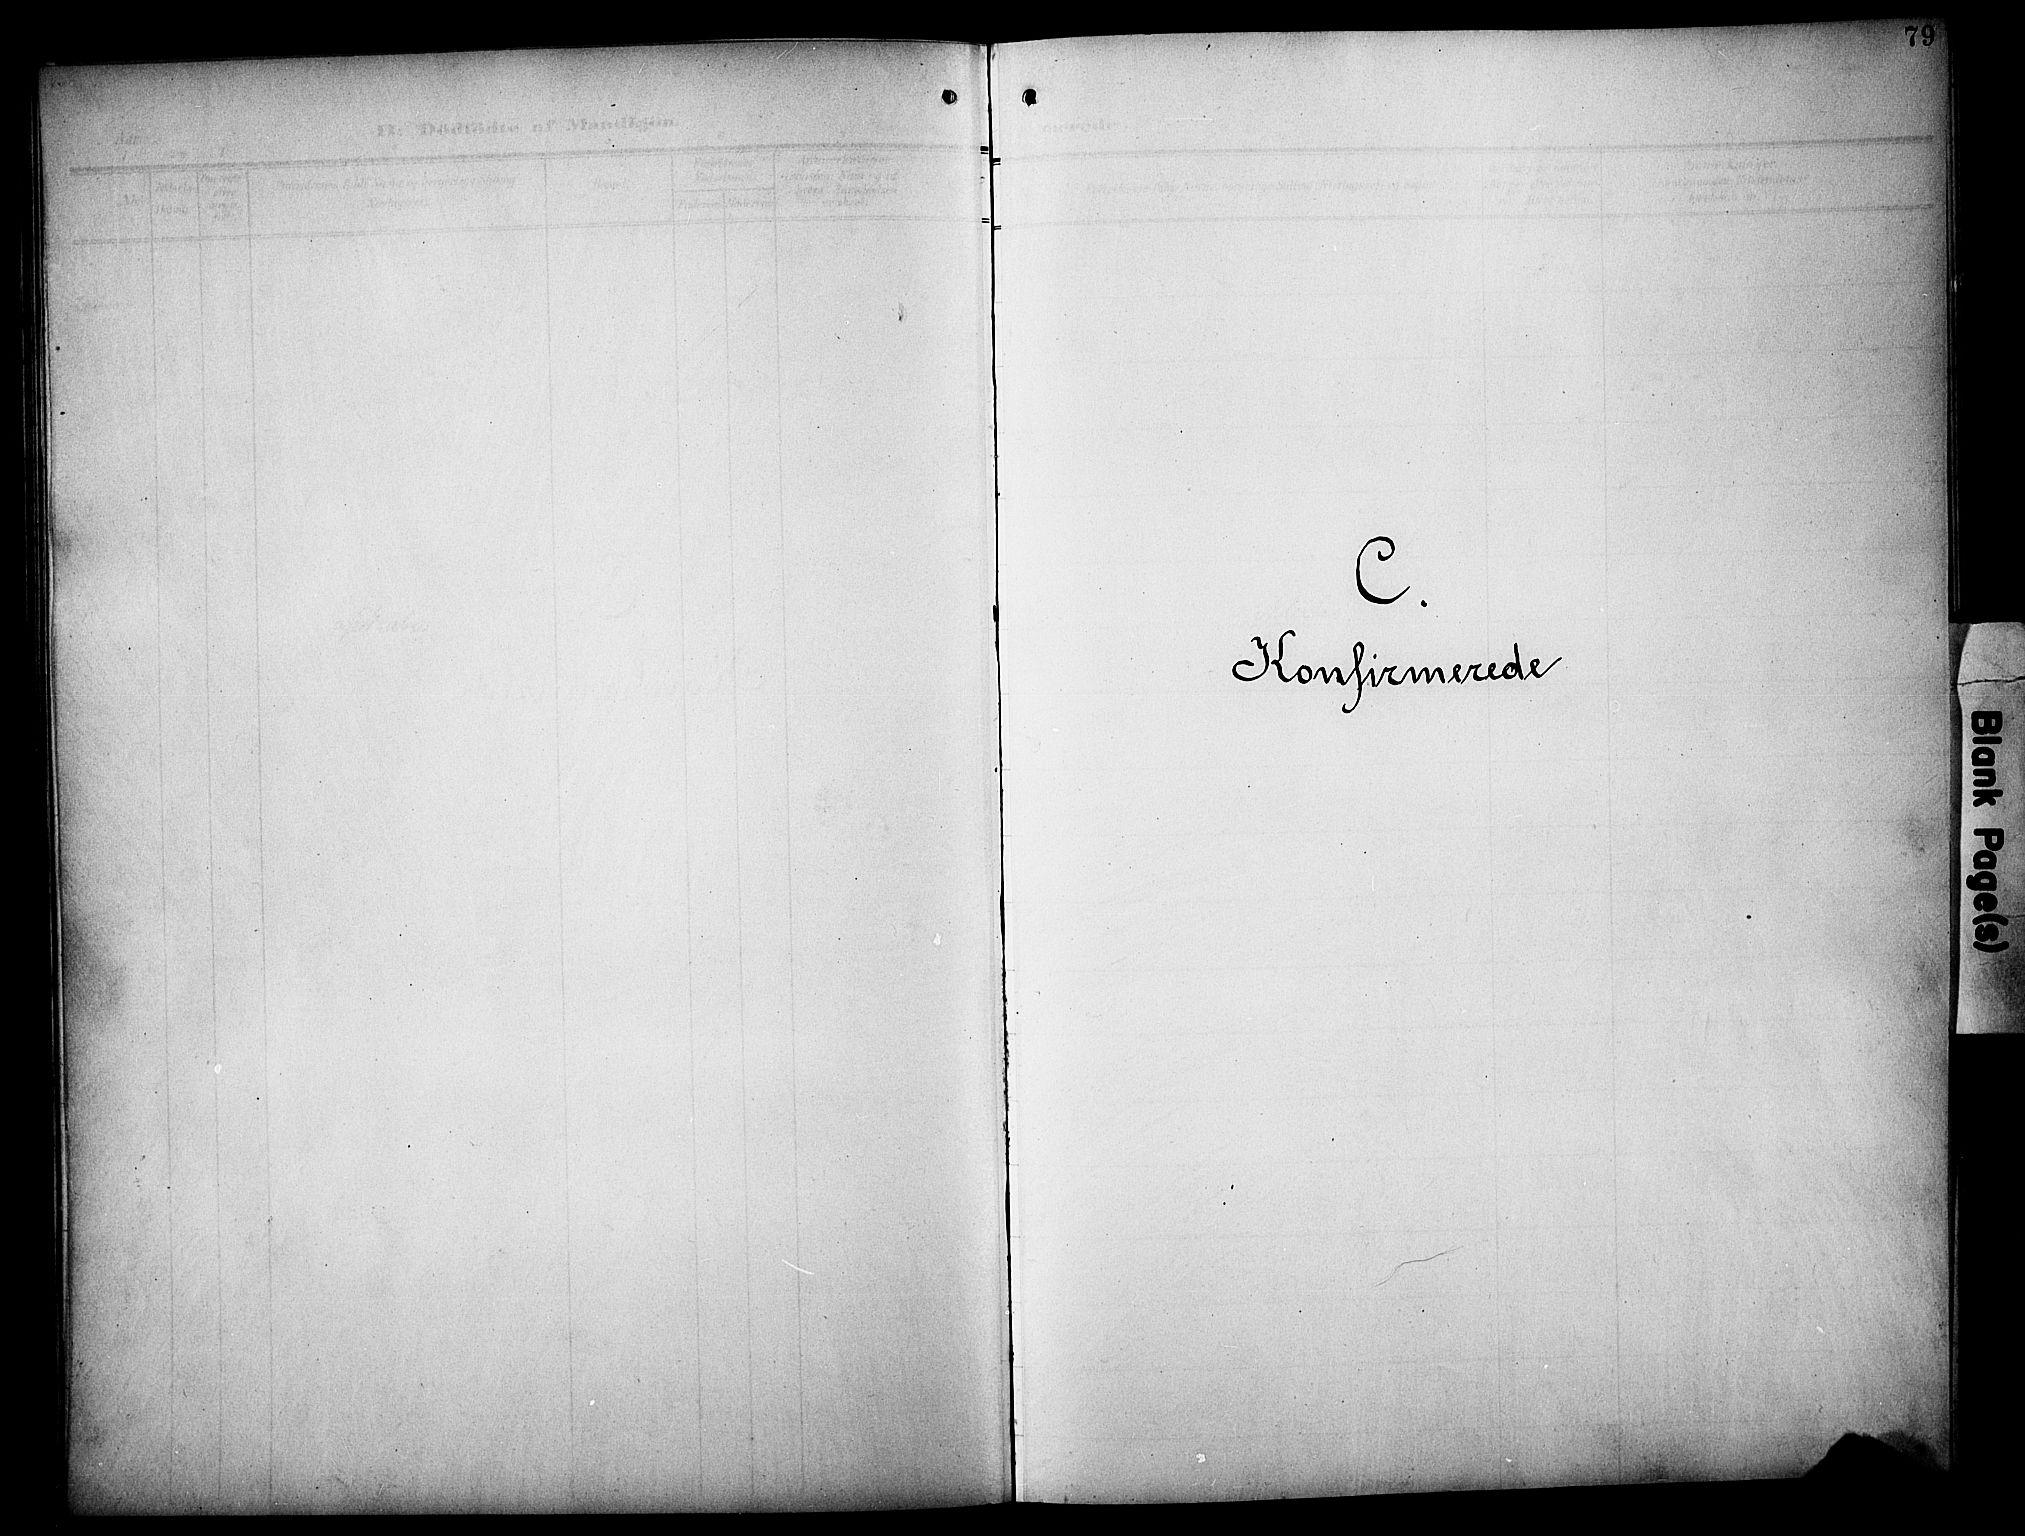 SAH, Øyer prestekontor, Klokkerbok nr. 6, 1906-1929, s. 79